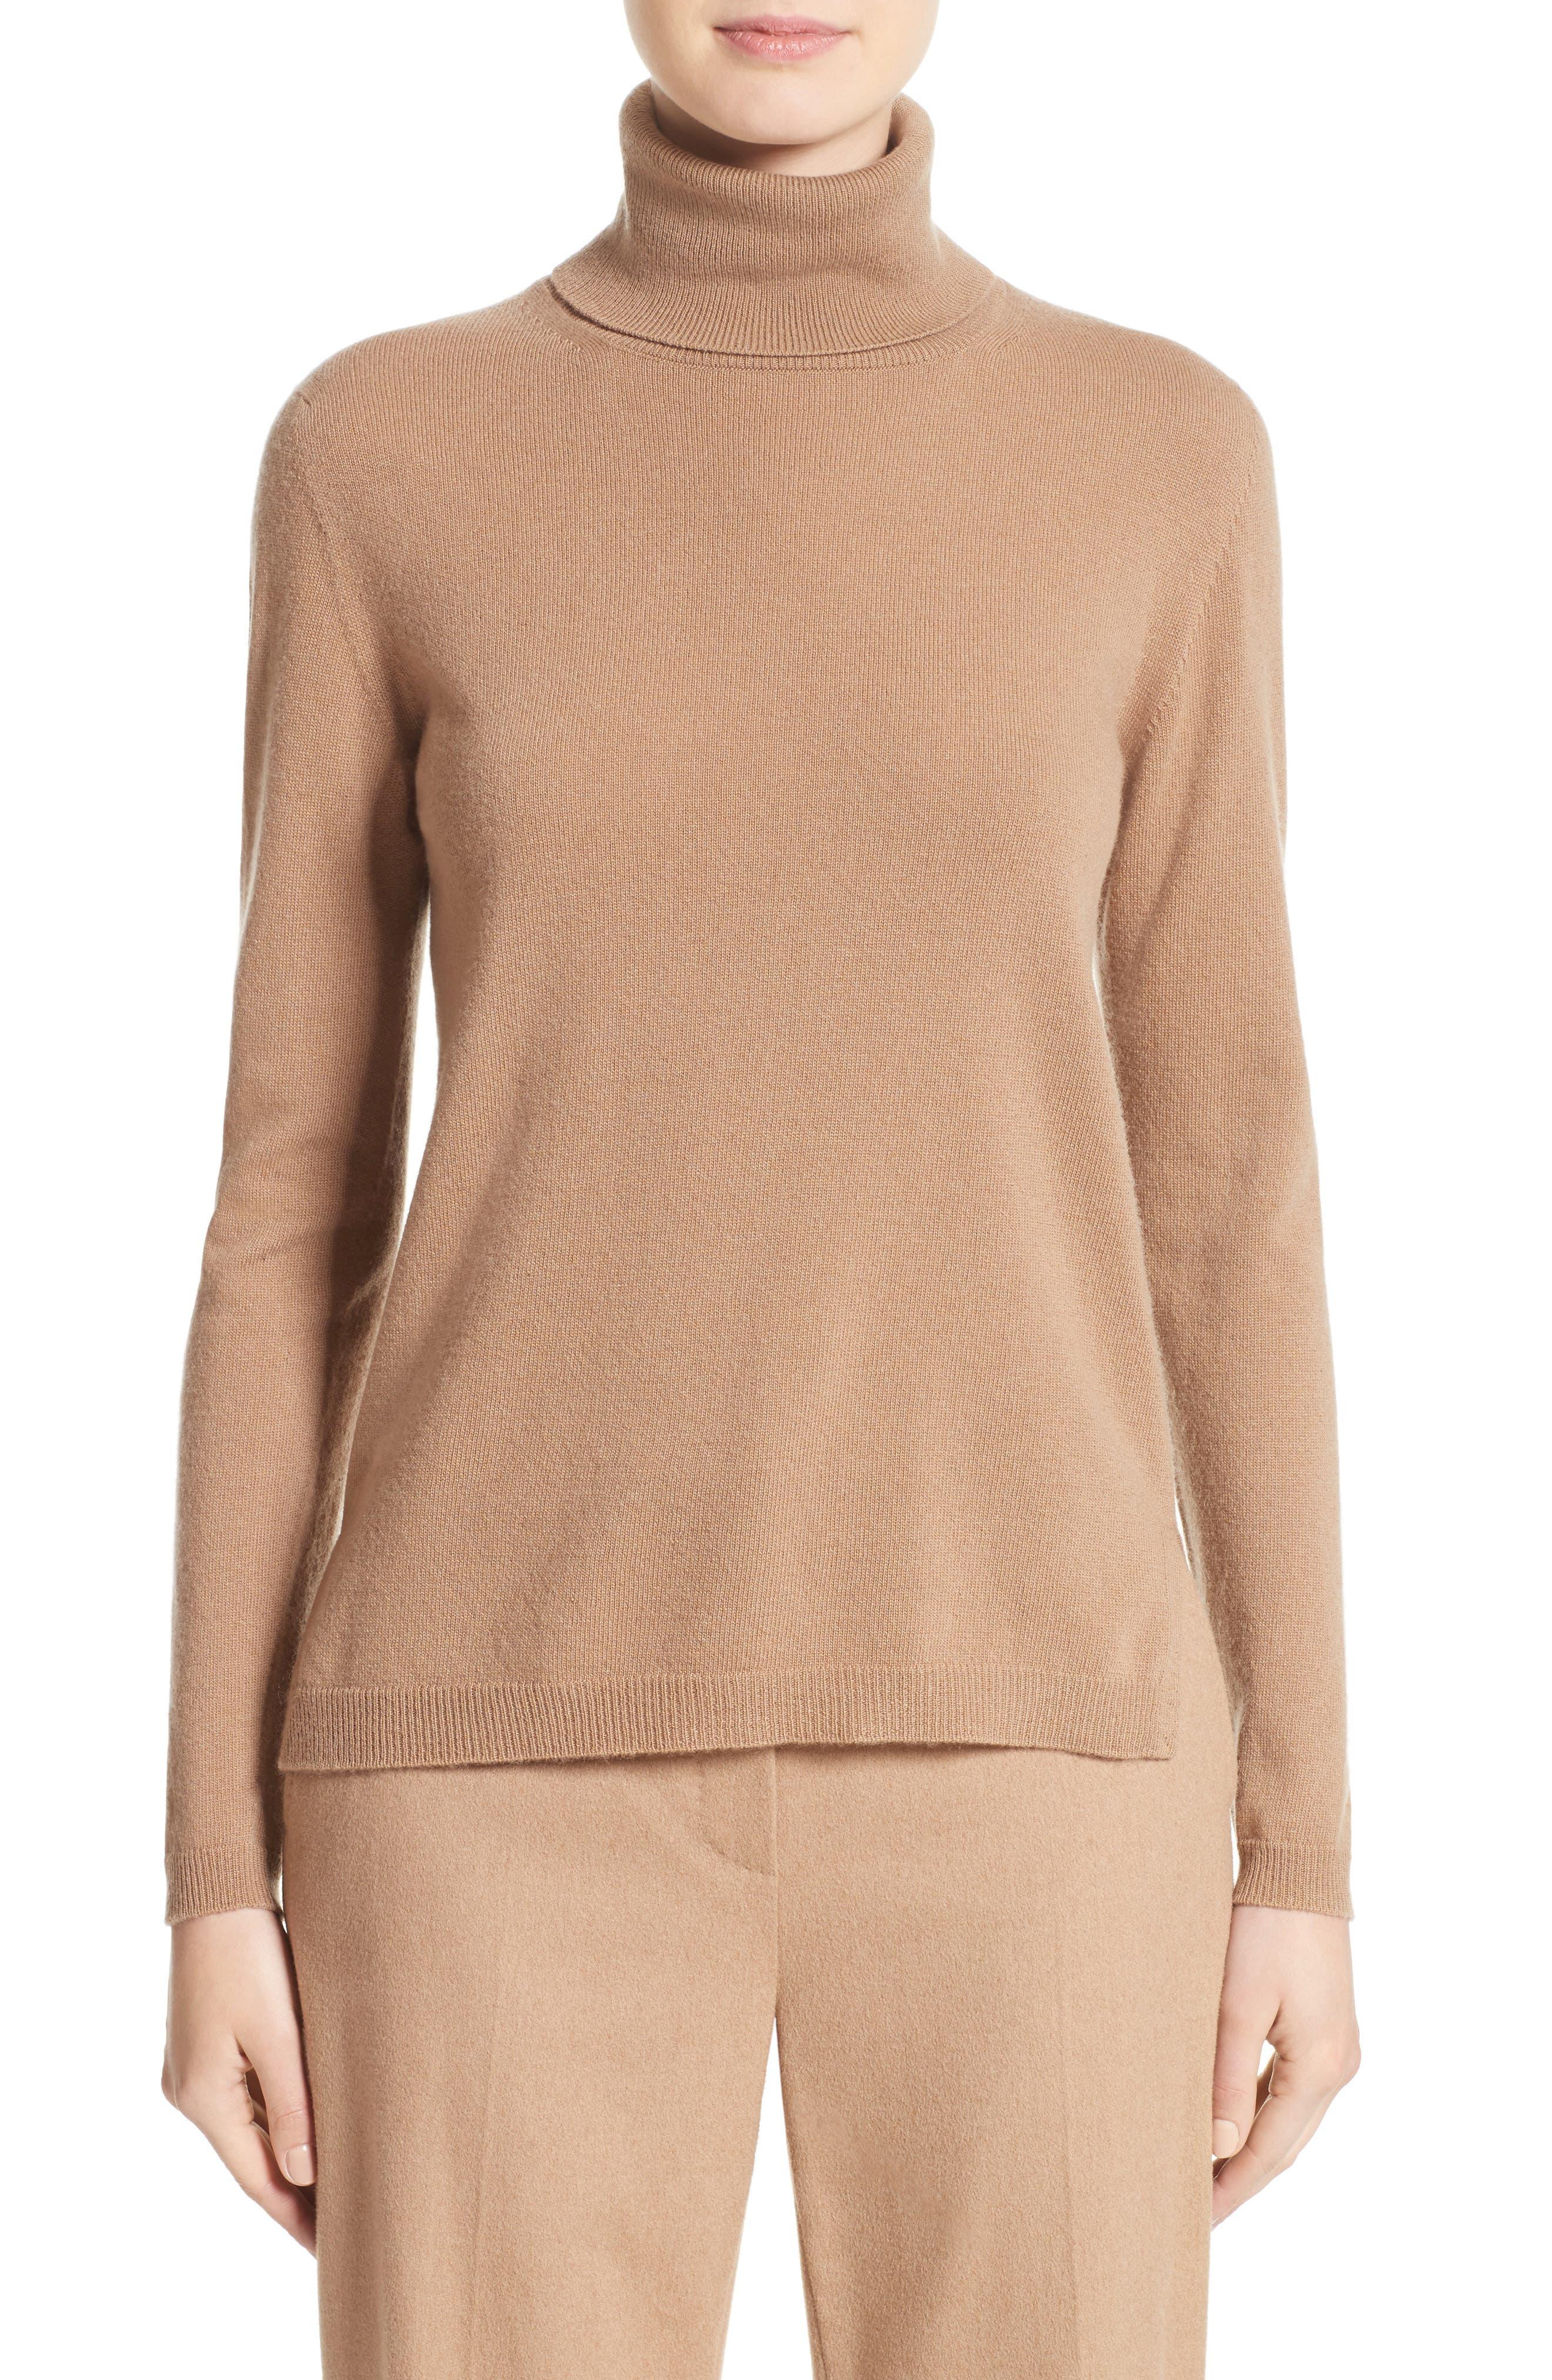 Max Mara Nigeria Wool & Cashmere Turtleneck Sweater